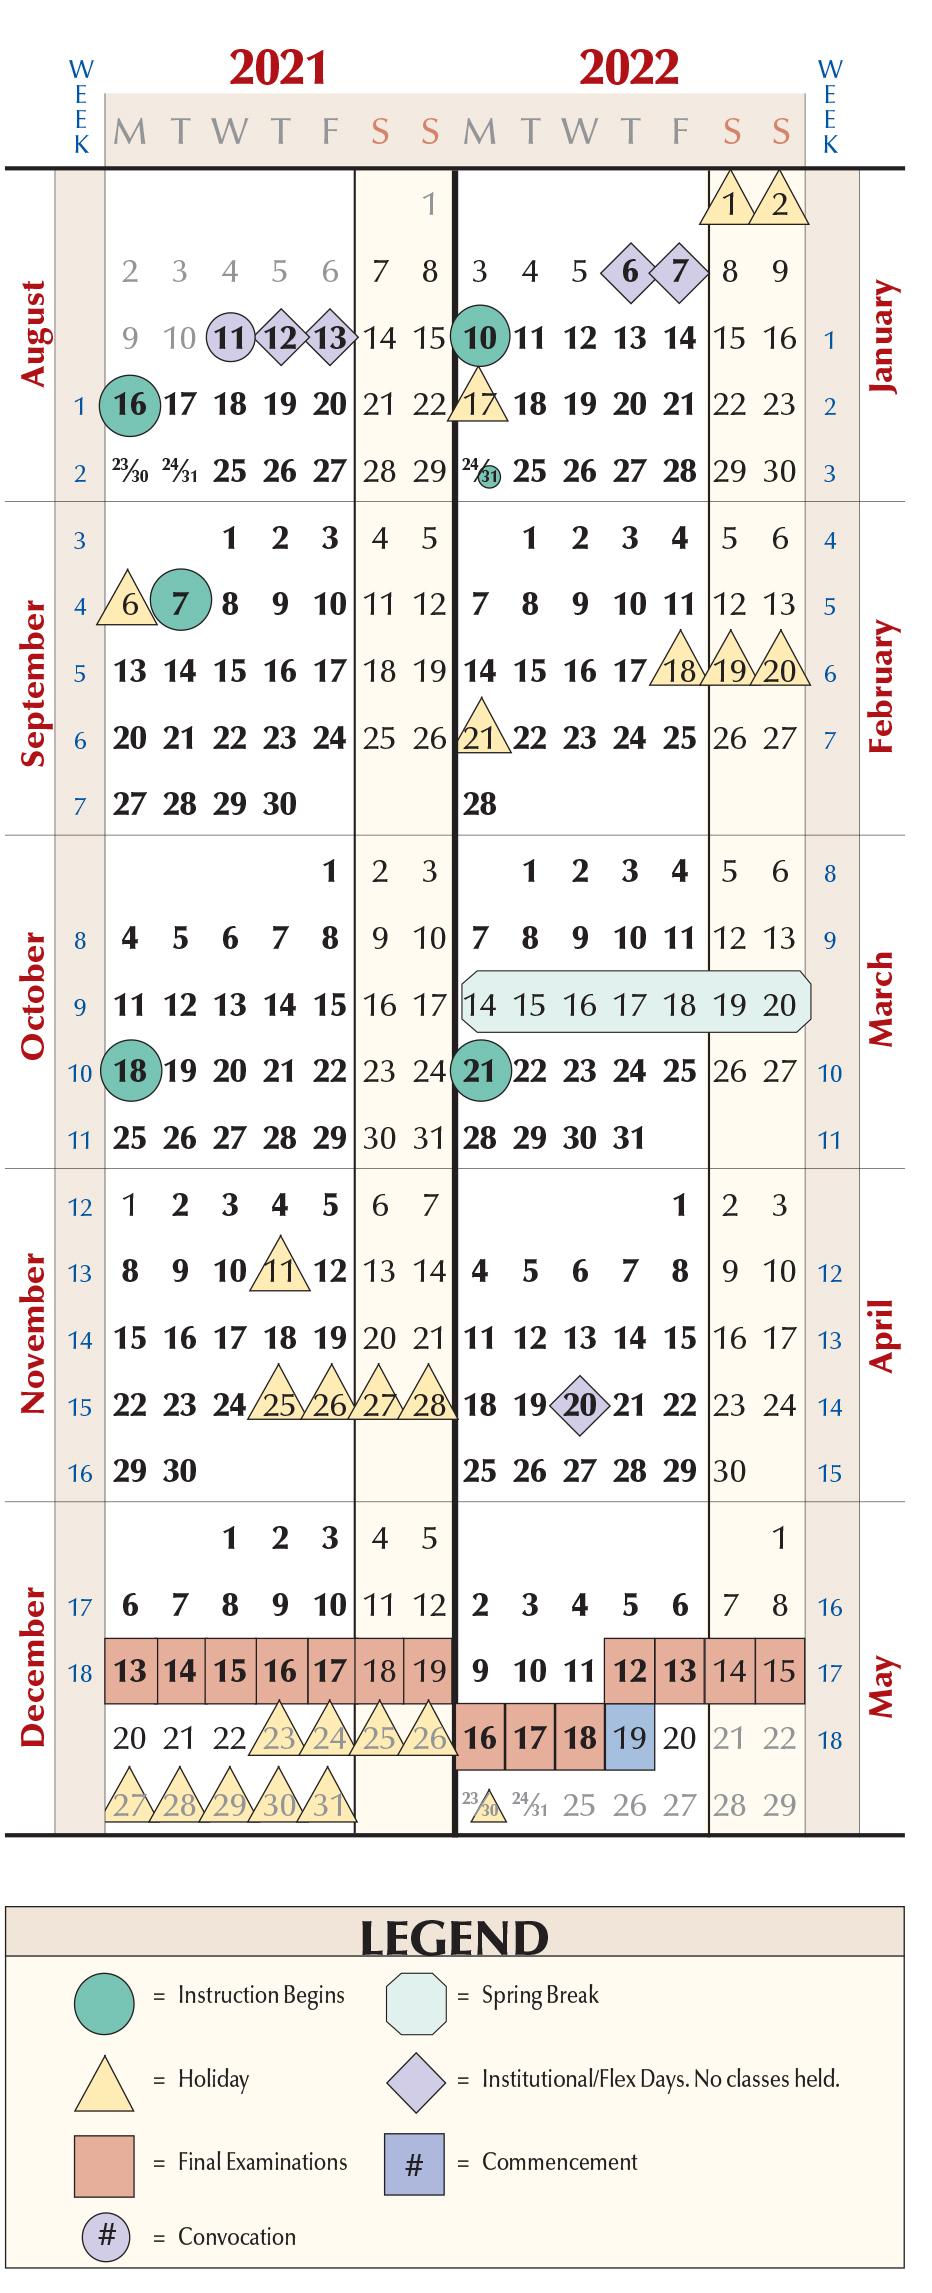 Niu Academic Calendar 2022.Spring 2022 Calendar